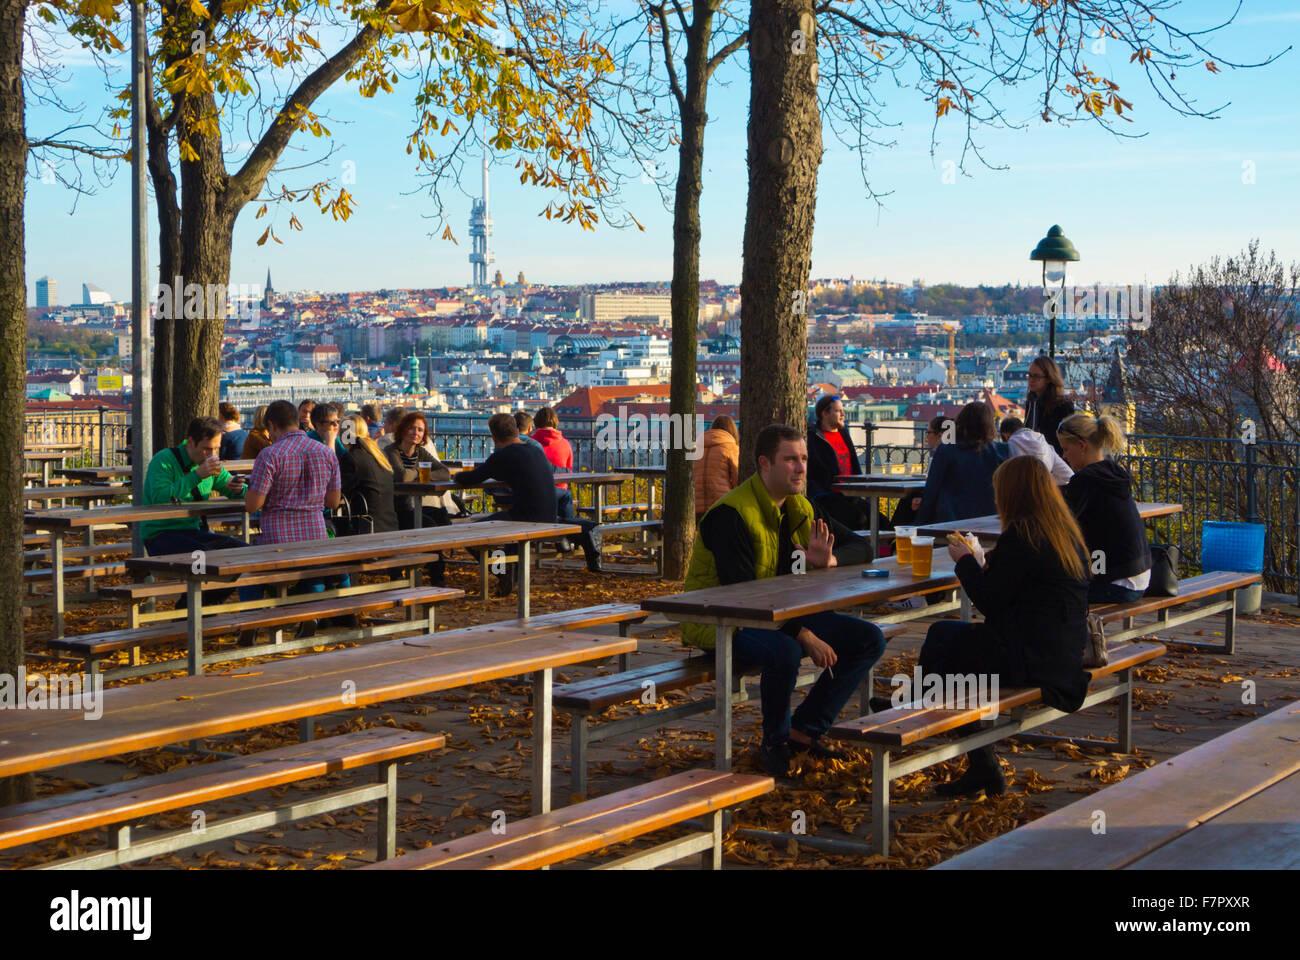 Beer garden, Letenske sady, Letna Park, Prague, Czech Republic Stock Photo